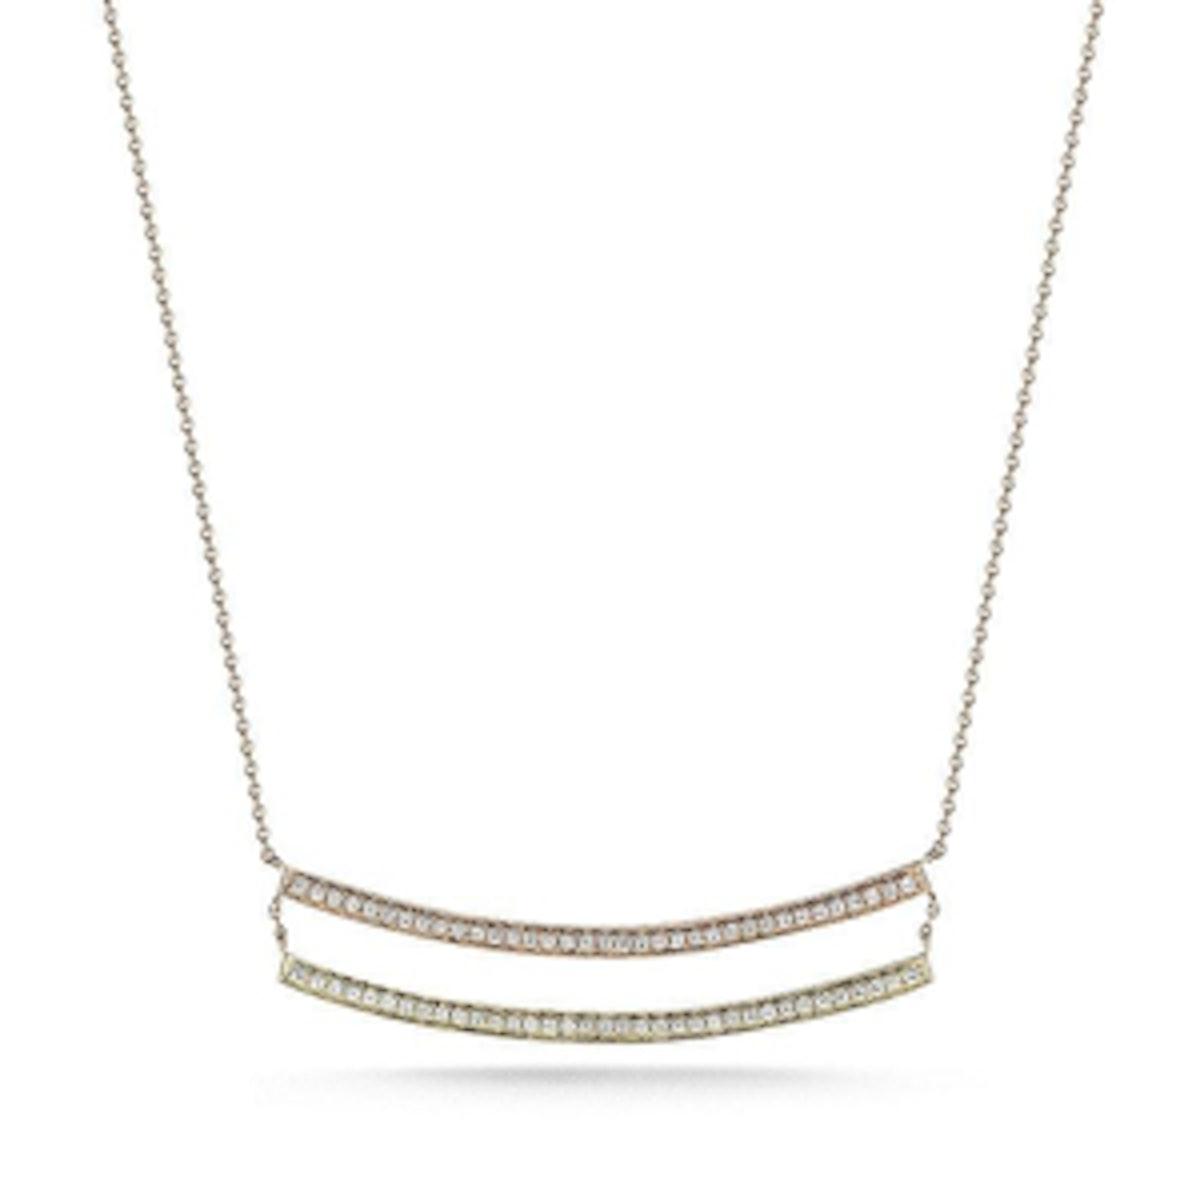 Sylvie Rose Double Bar Necklace